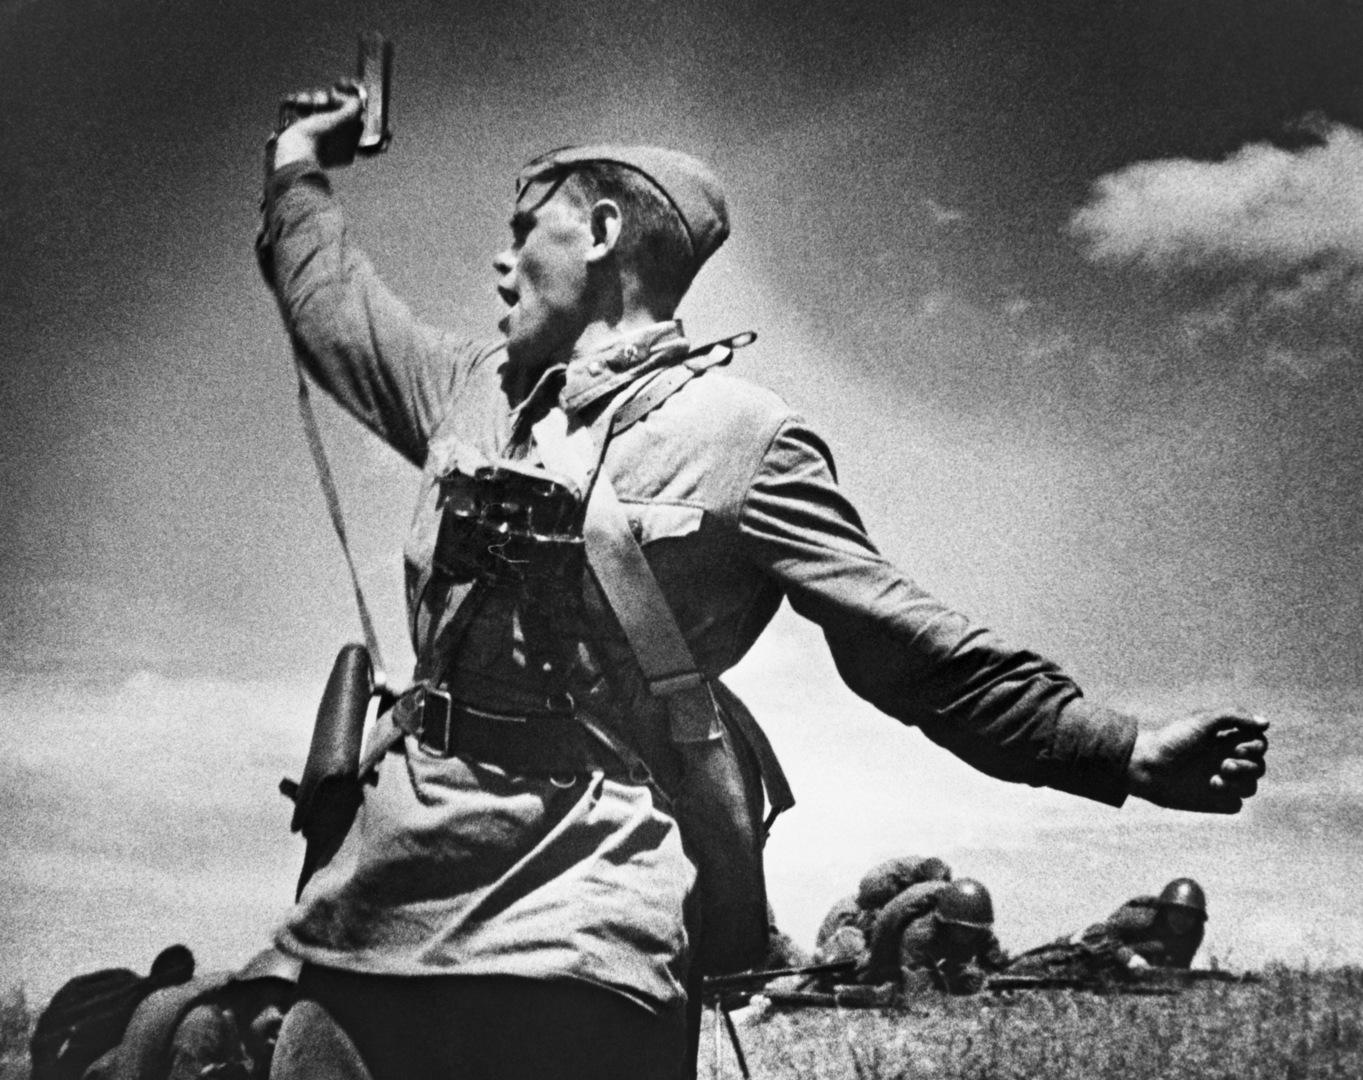 RT تحتفل بمرور 75 عاما للانتصار على النازية